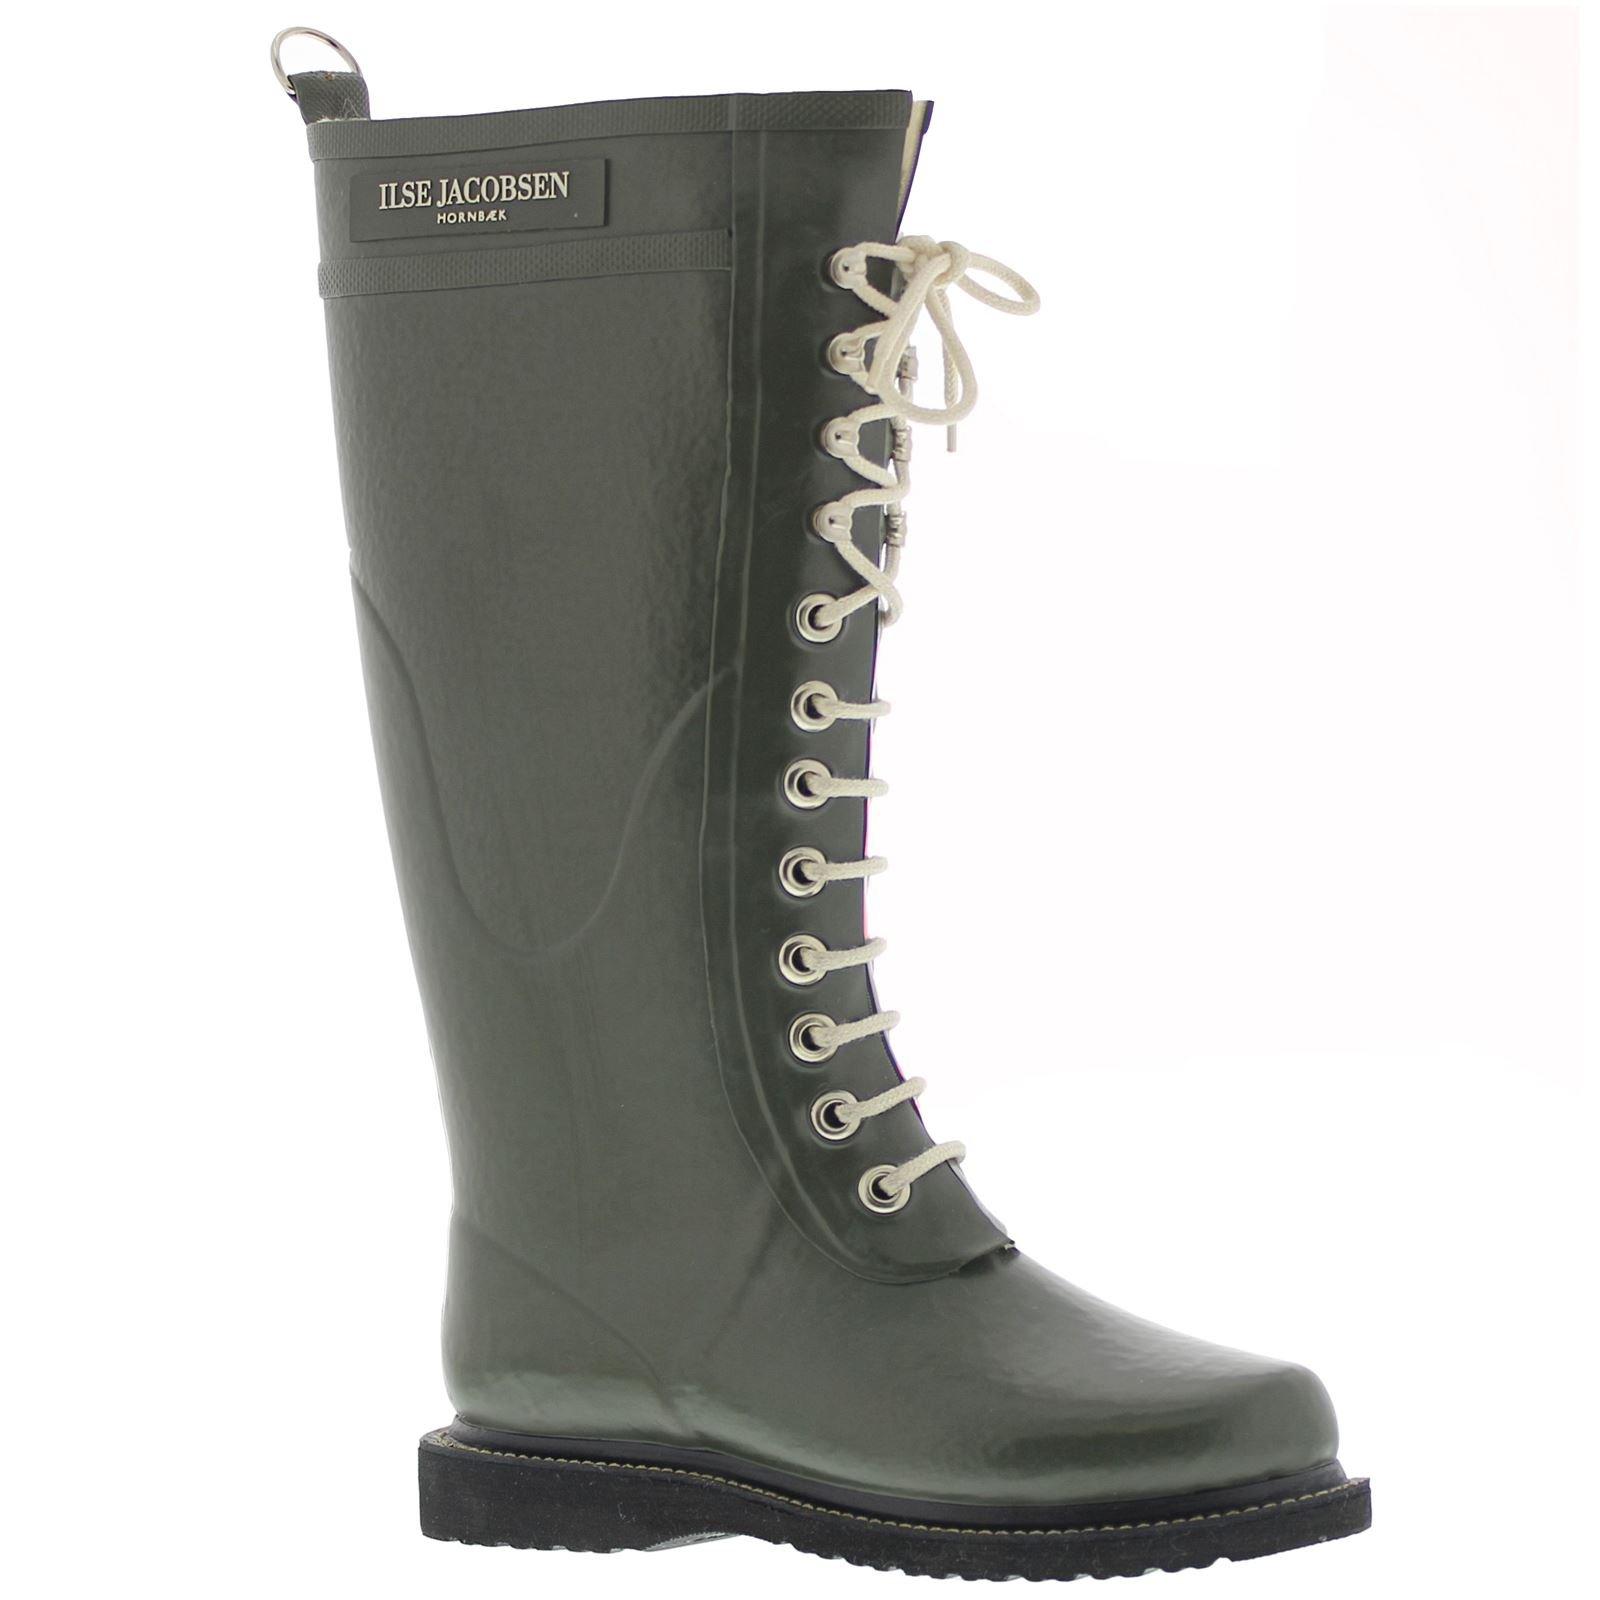 Ilse Jacobsen Rub1 Boot - Women's Army 37 by ILSE JACOBSEN